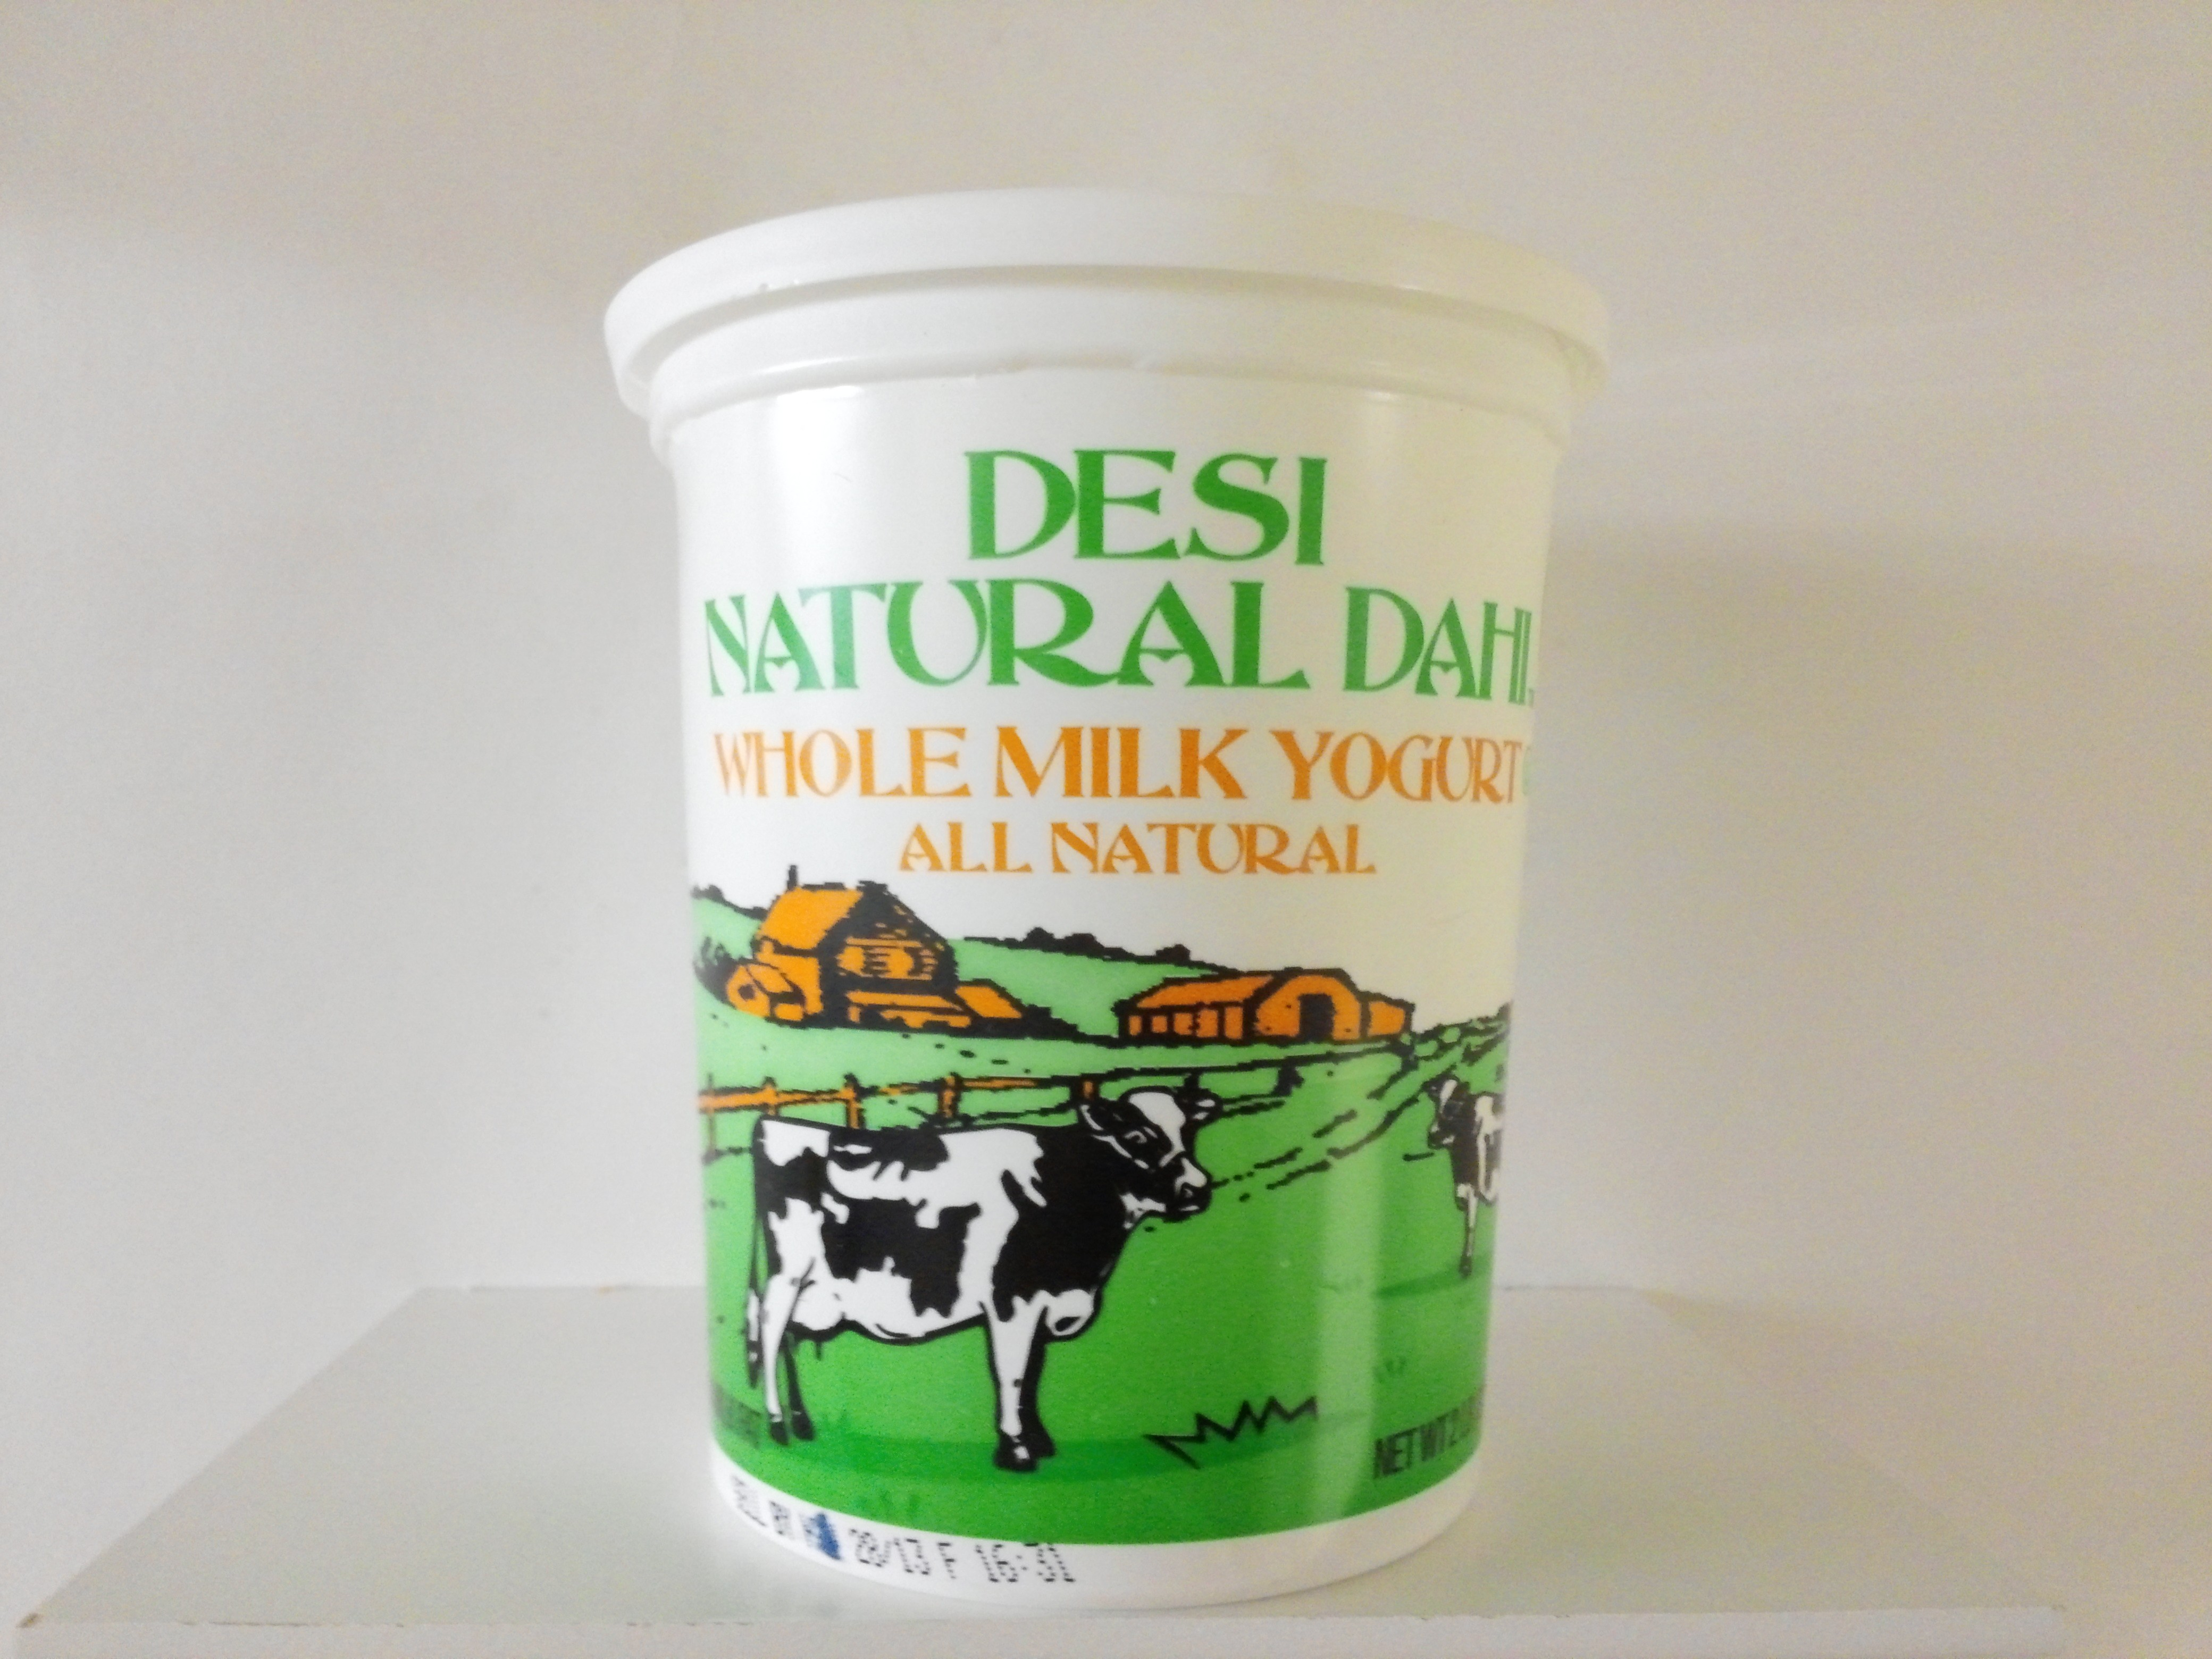 Desi Whole Milk Yogurt 2 lbs